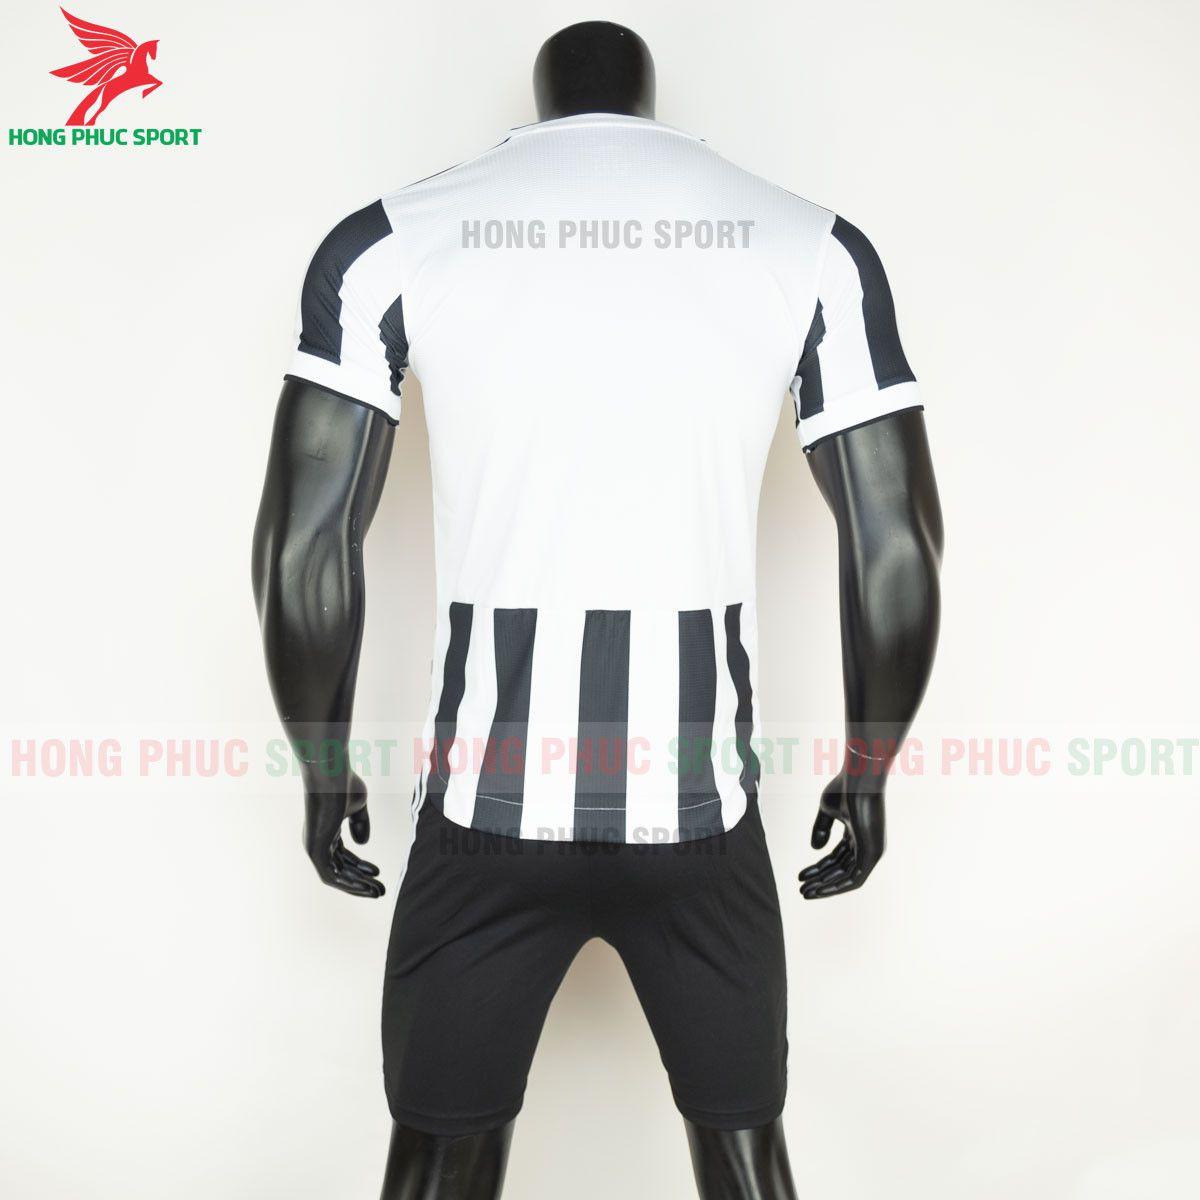 https://cdn.hongphucsport.com/unsafe/s4.shopbay.vn/files/285/ao-bong-da-juventus-2021-2022-san-nha-hang-thai-8-60d3096143189.jpg